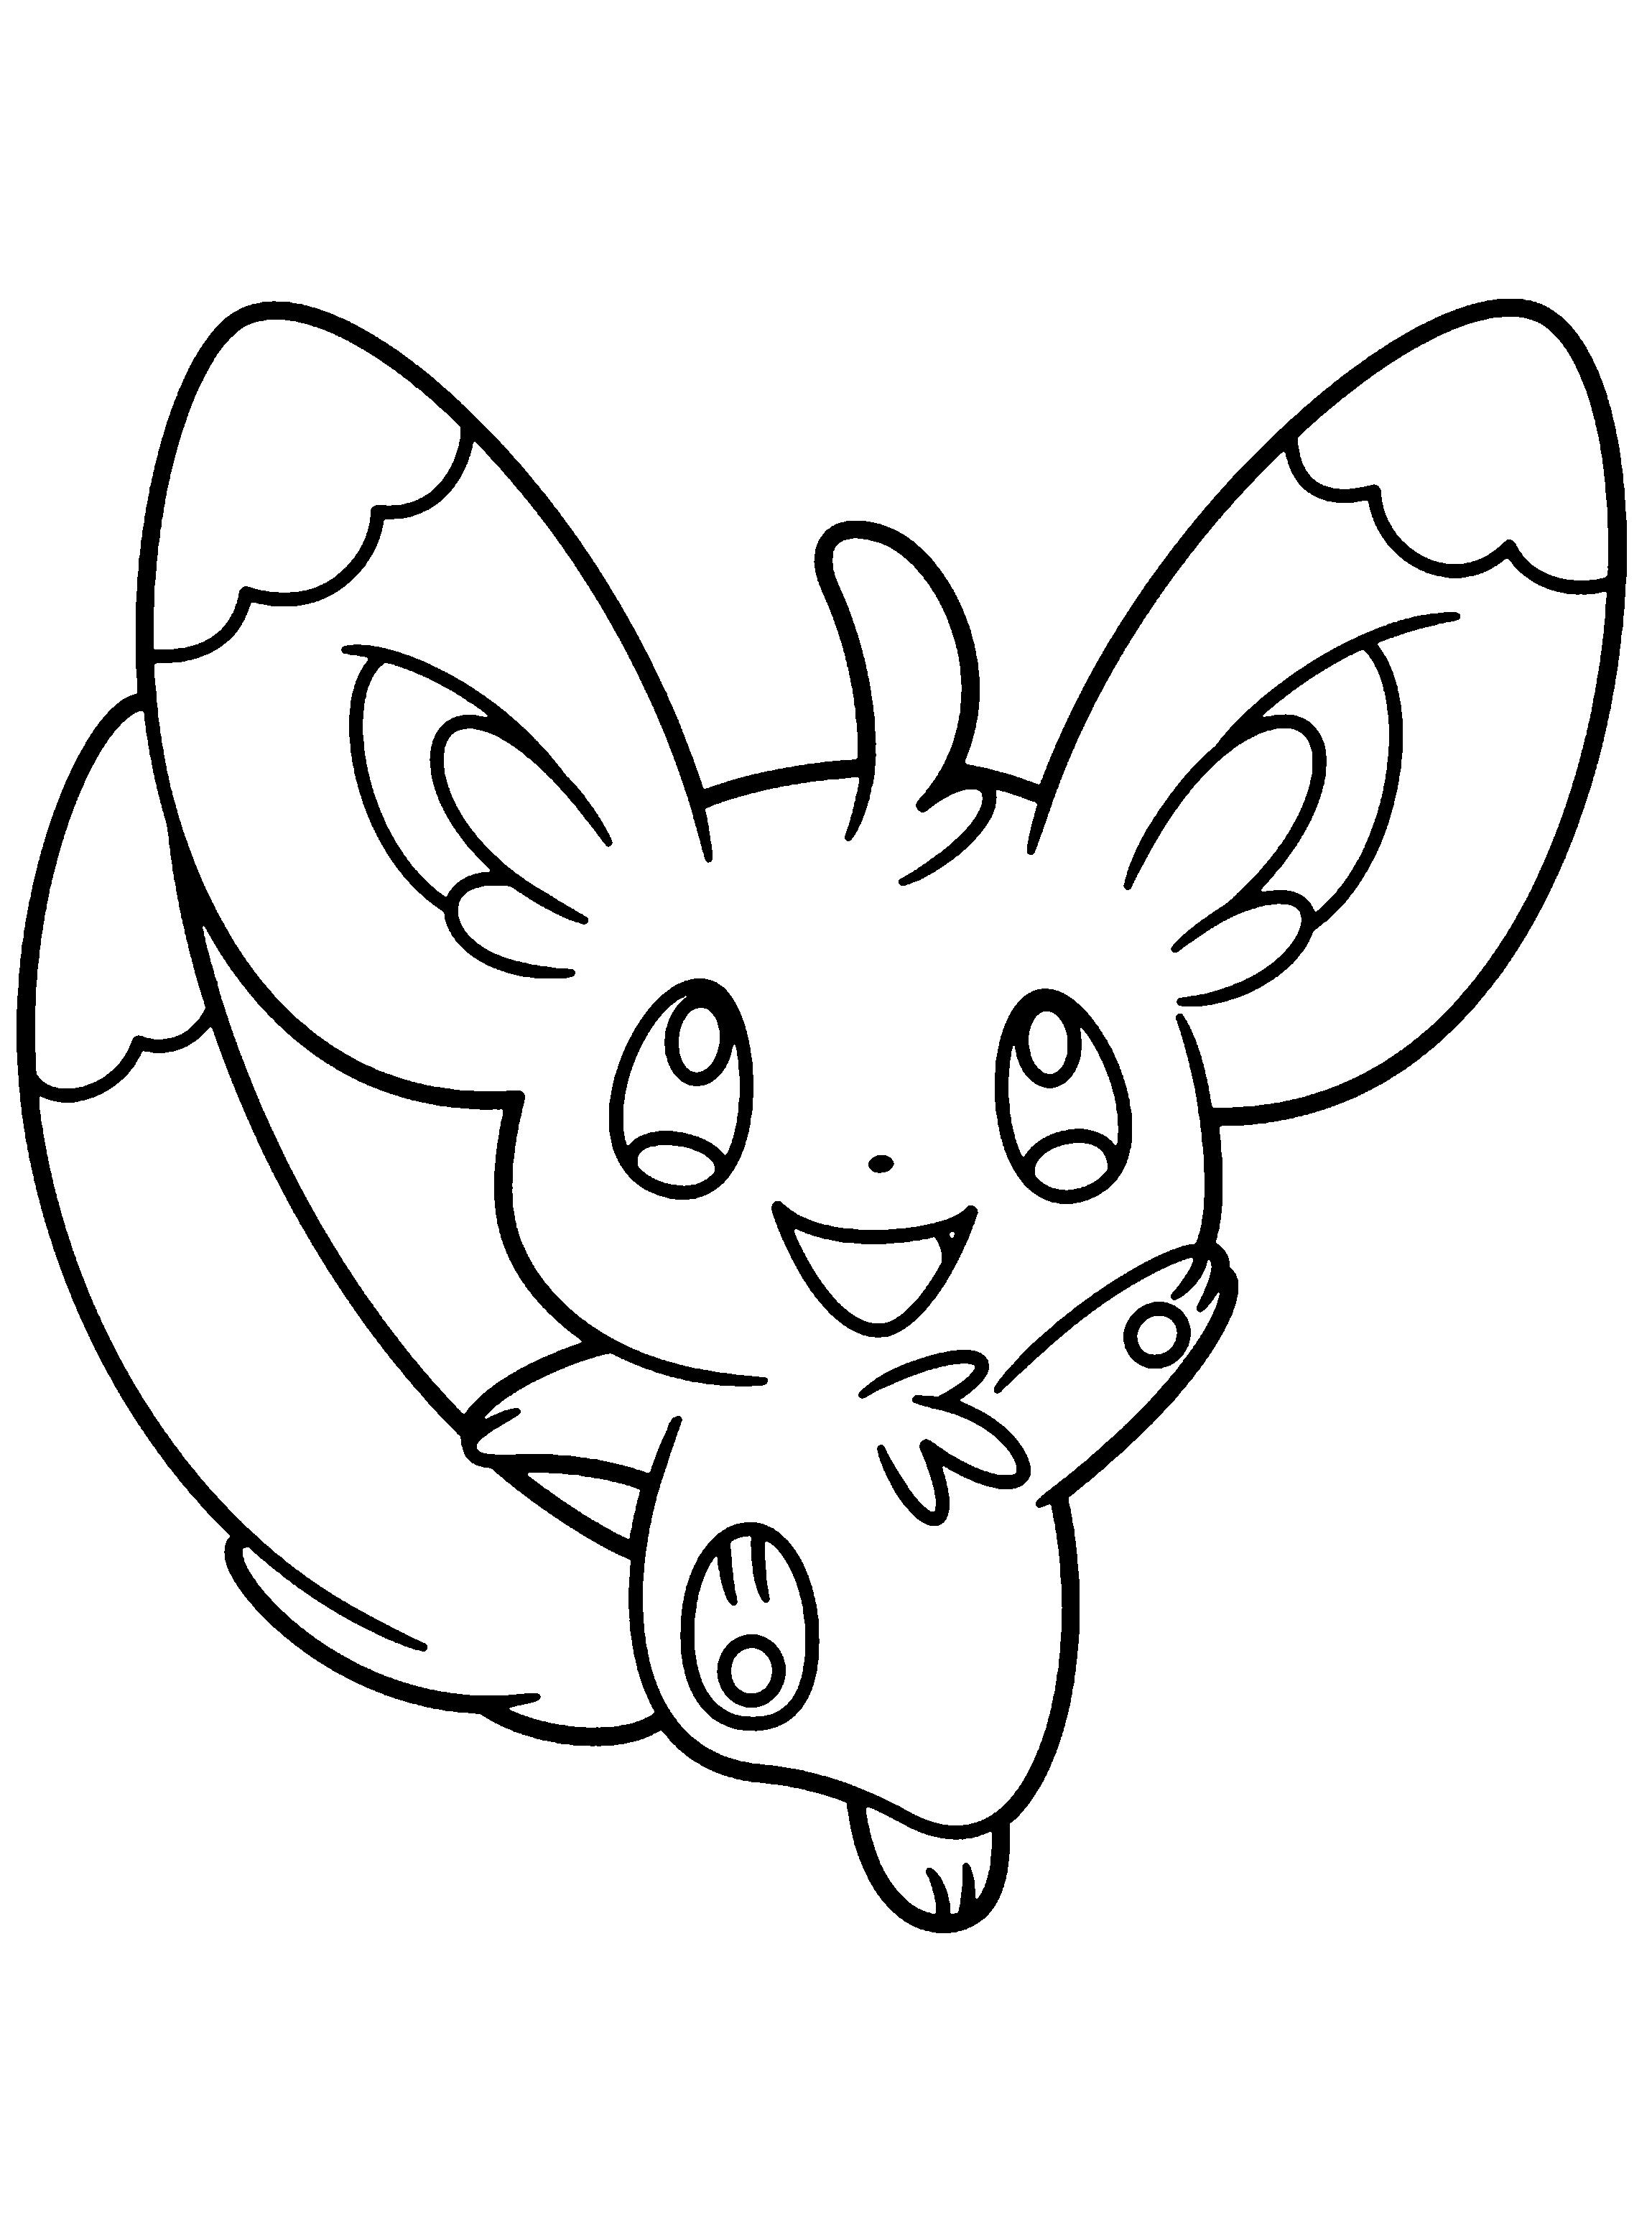 Kleurplaten Pokemon Xyz Pokemon Black Malvorlagen Malvorlagen1001 De